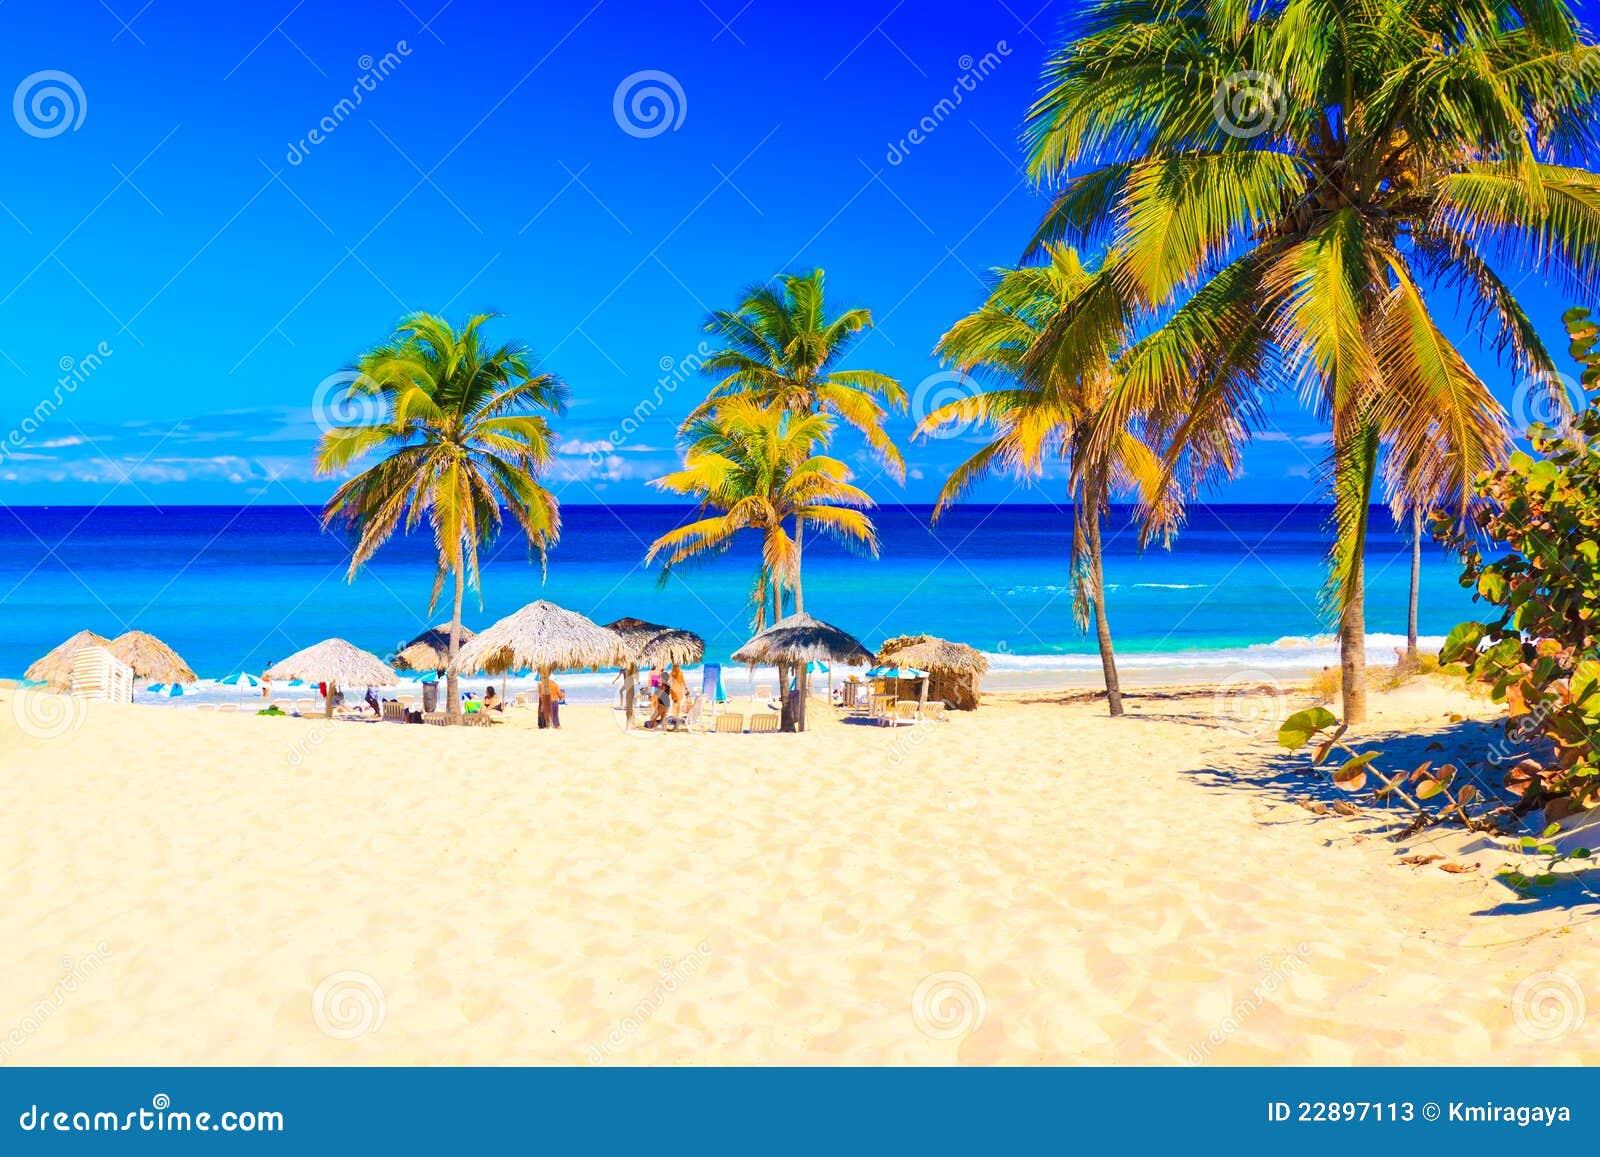 Het strand van Varadero in Cuba